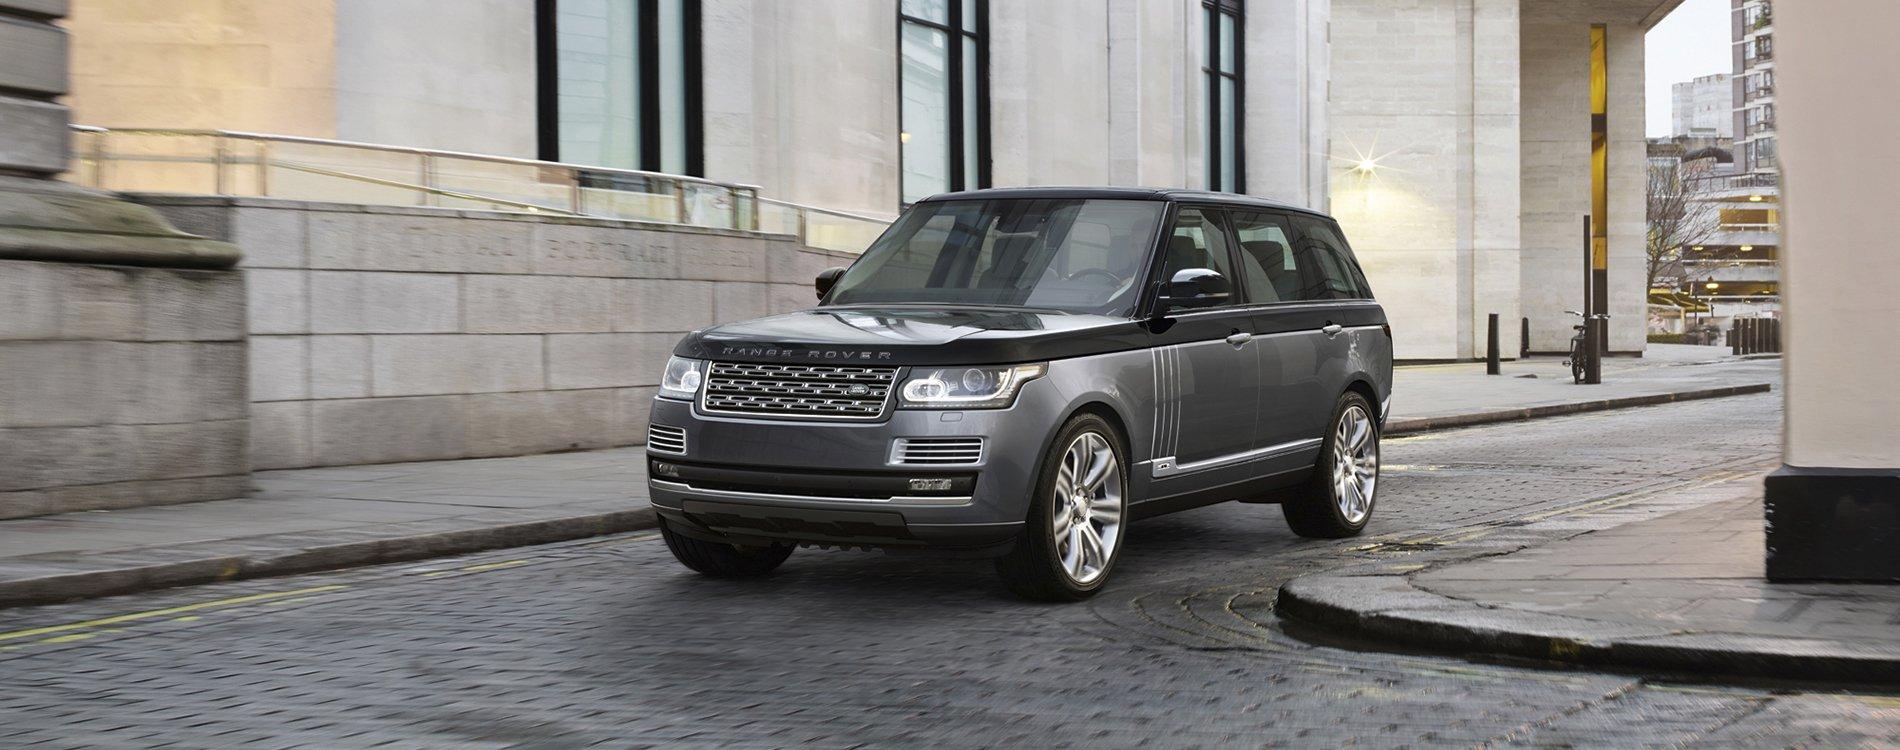 Range Rover SV Autobiography, lujo personalizado